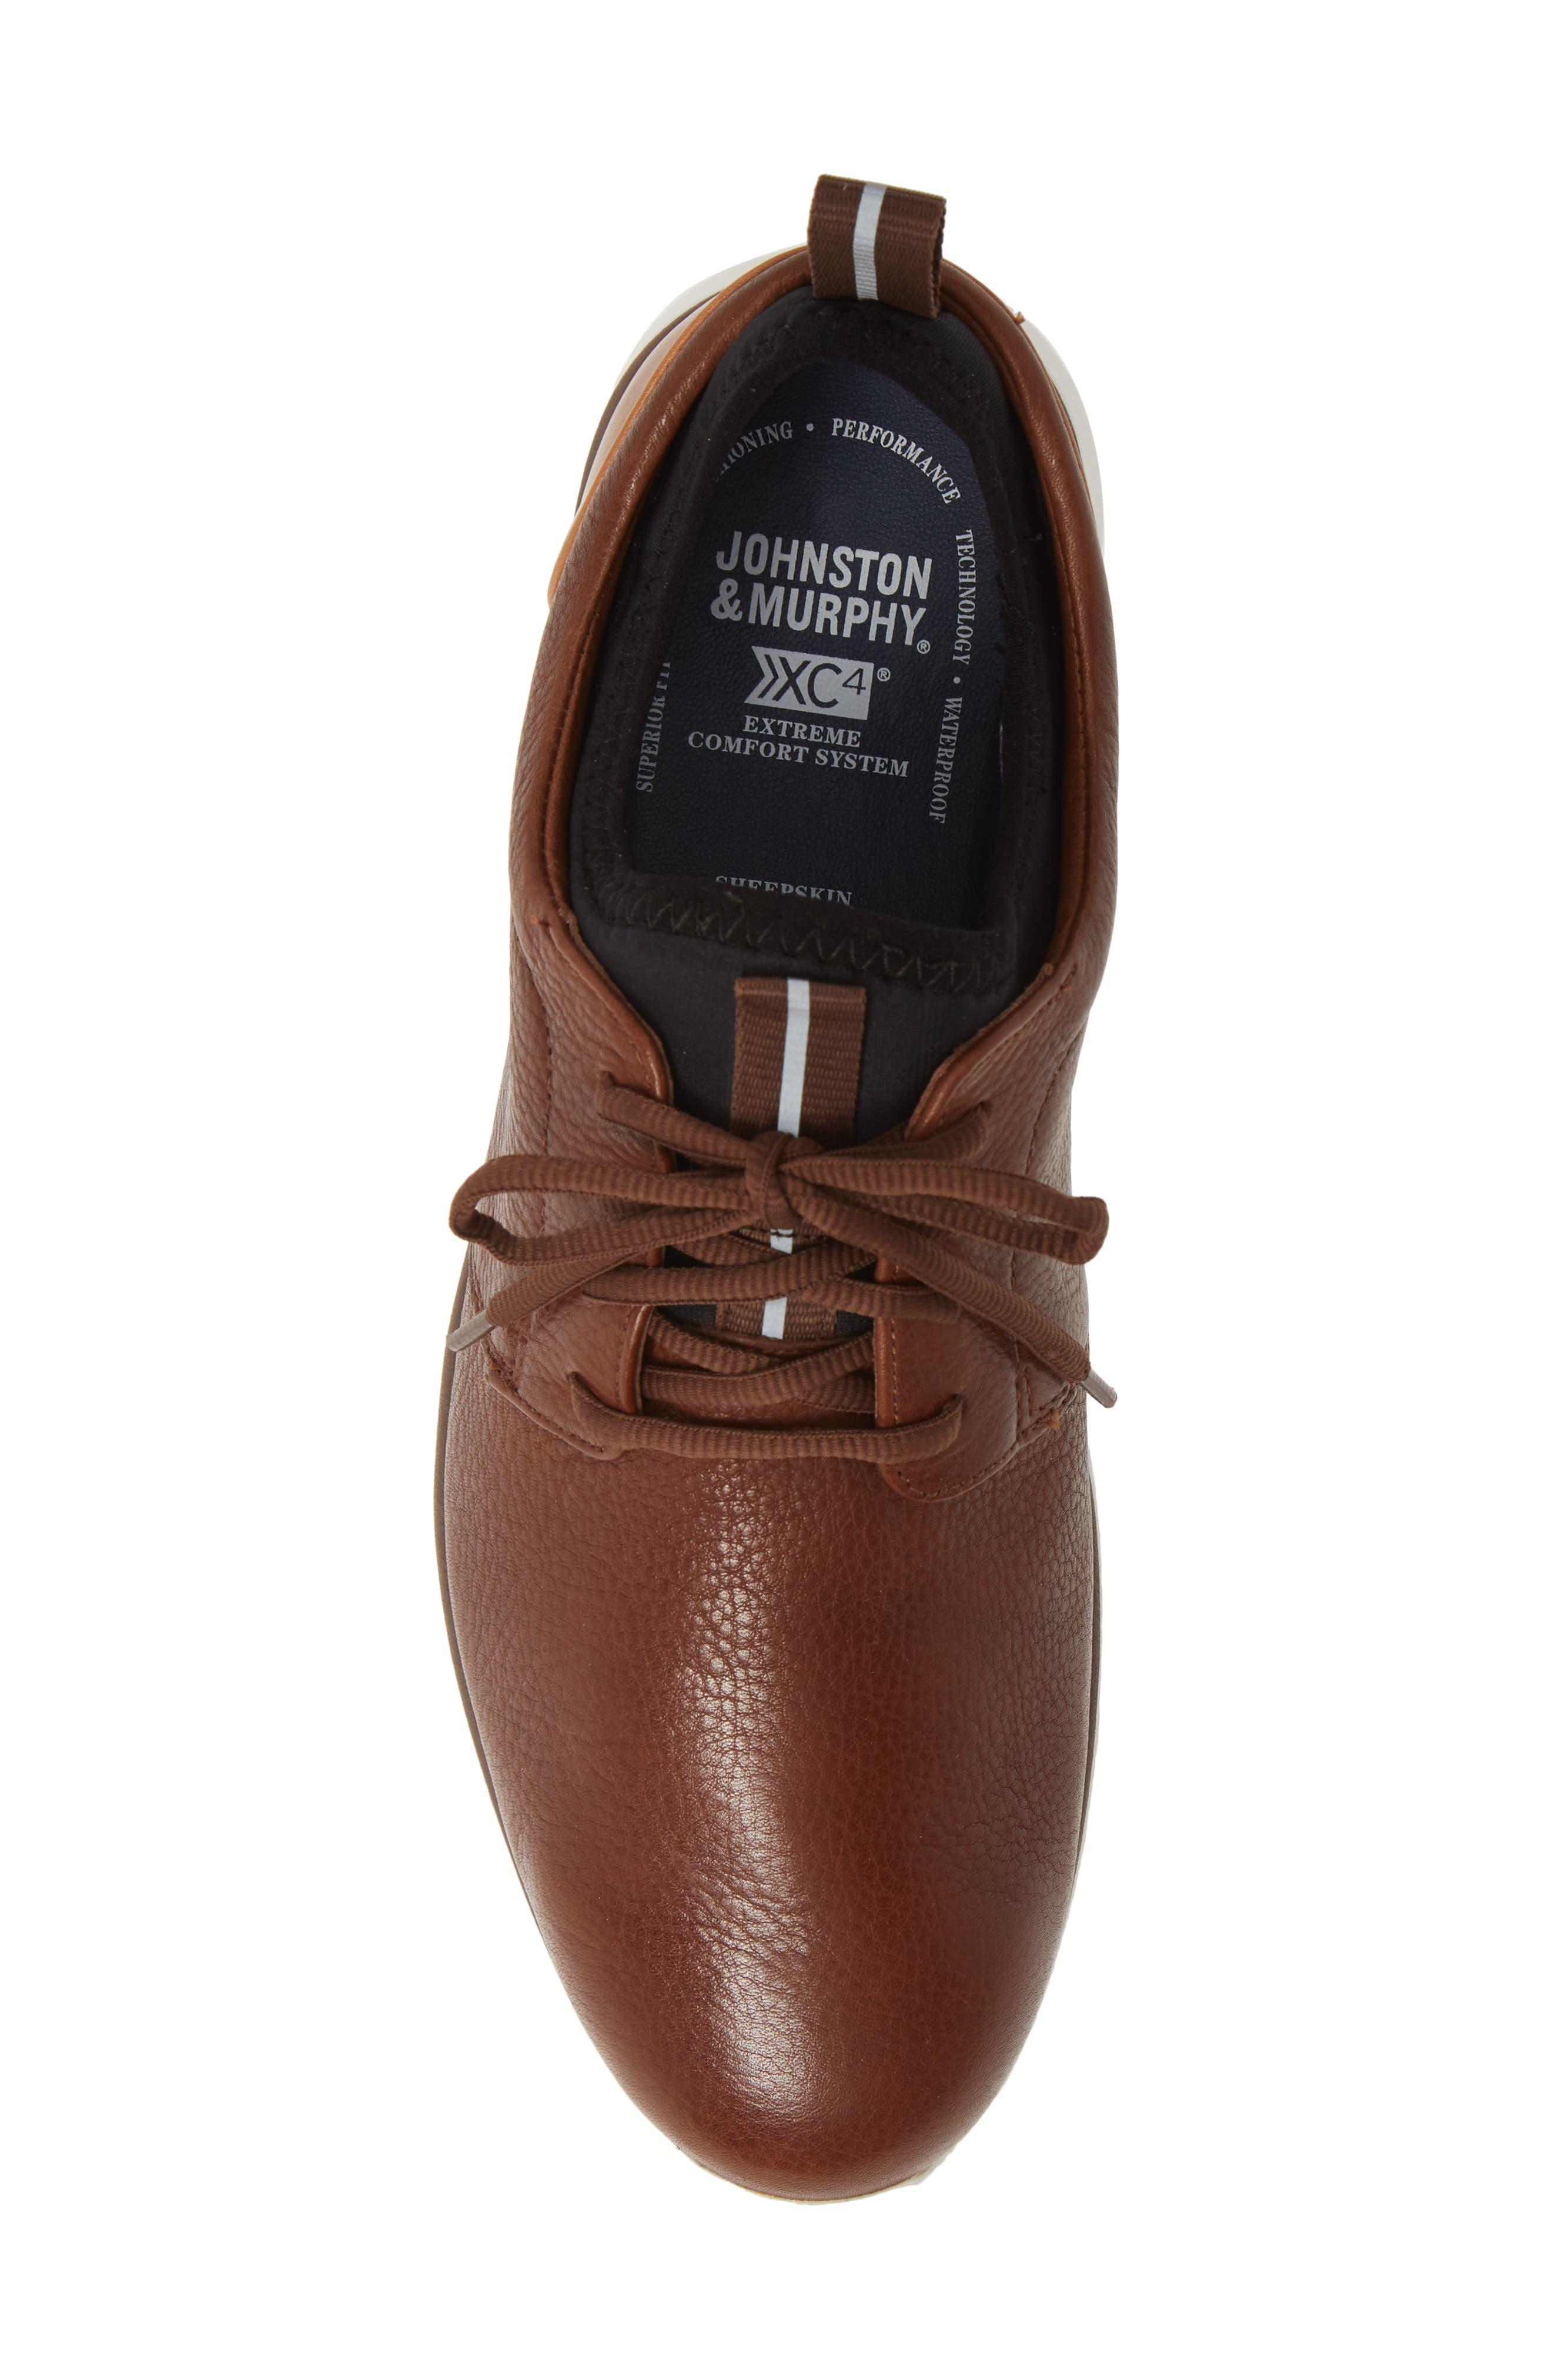 JOHNSTON & MURPHY, Prentiss XC4<sup>®</sup> Waterproof Low Top Sneaker, Alternate thumbnail 5, color, MAHOGANY LEATHER